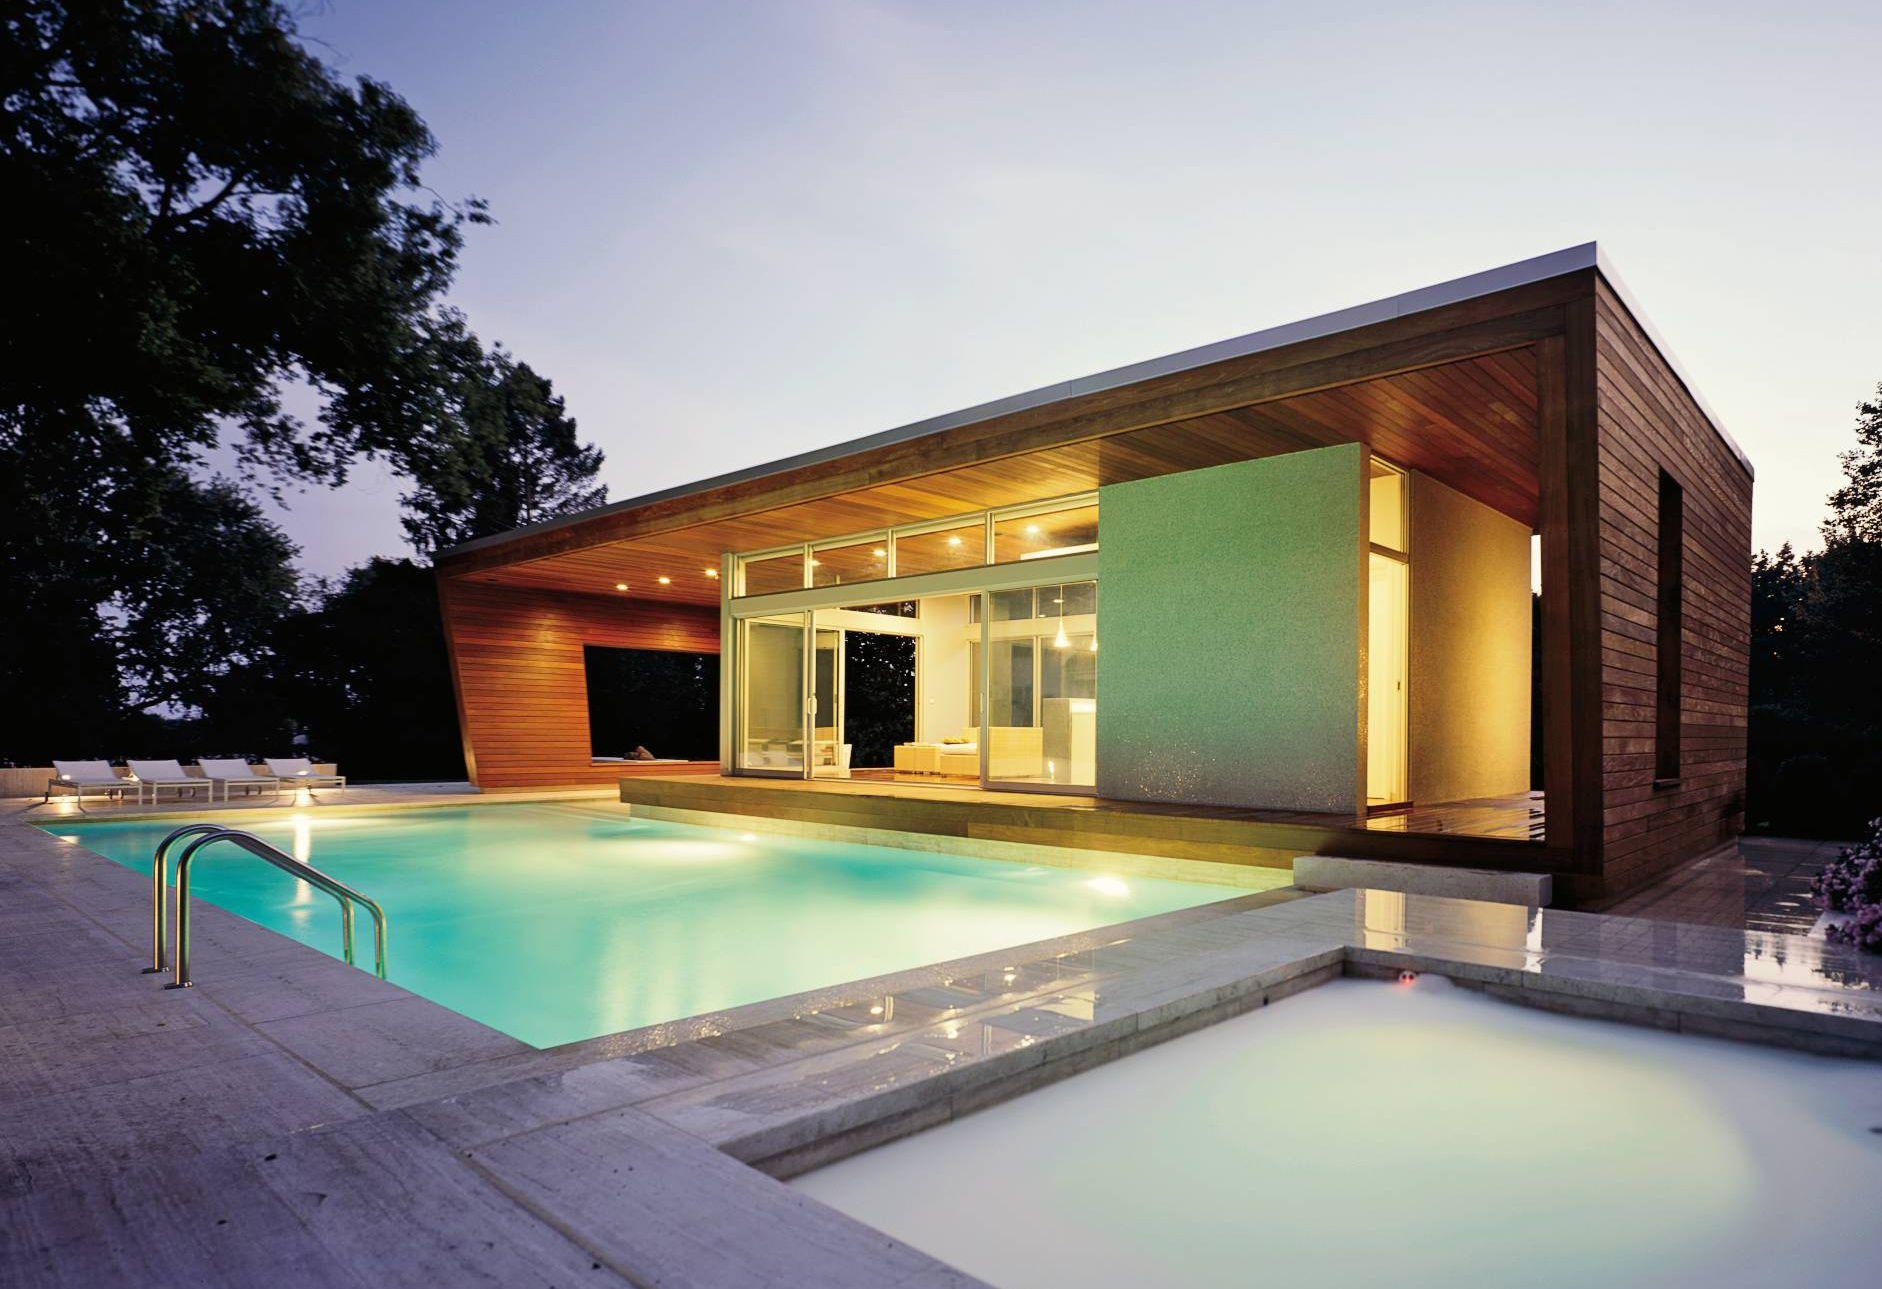 Swimming Pool Pool House Minimalist Design On Design Ideas Pool Luxury House Pool Designs Maison Piscine Moderne Architecture Maison Moderne Pavillon Exterieur